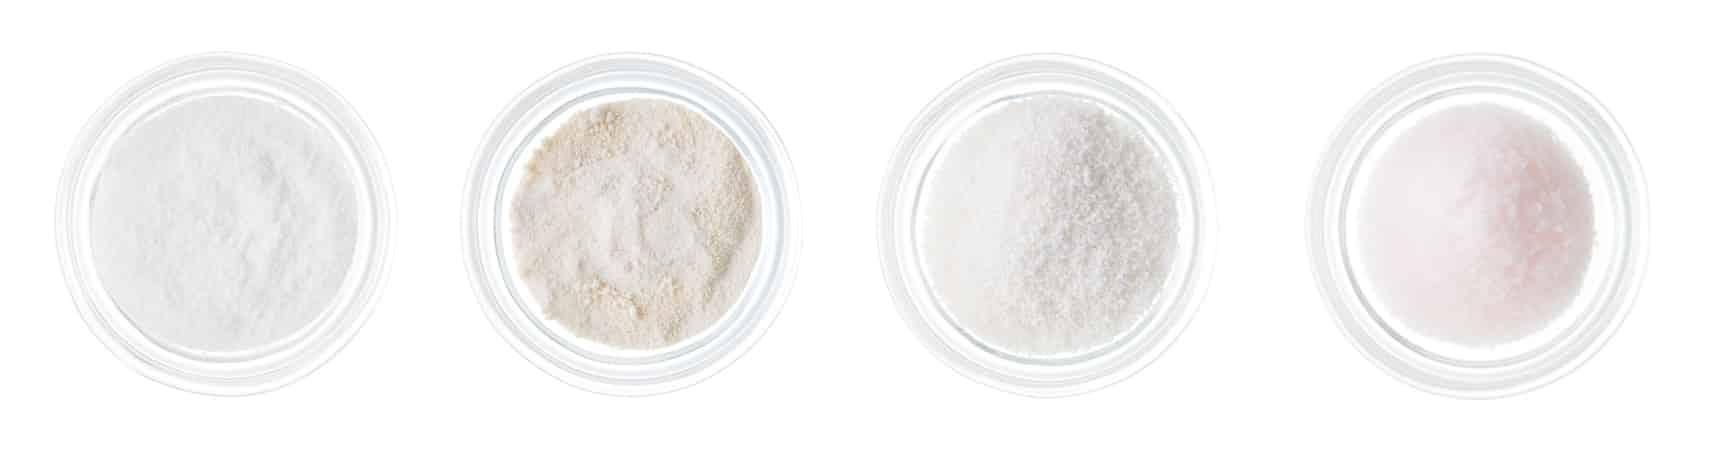 acid-powders